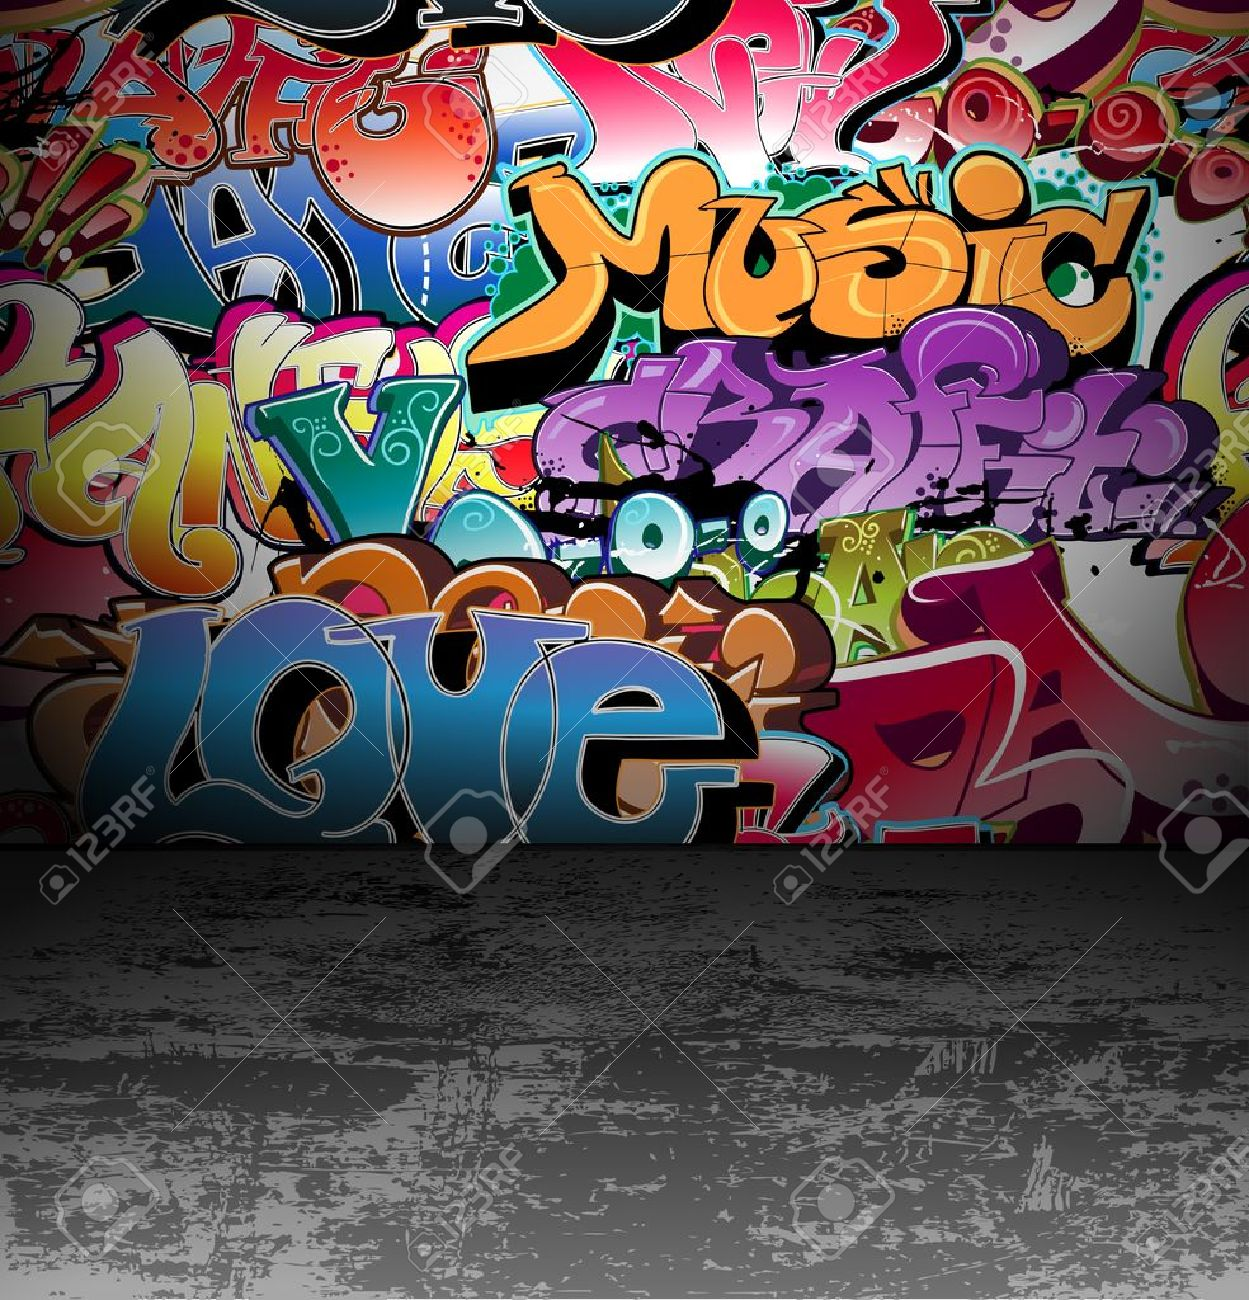 Graffiti wall vector free - Graffiti Wall Urban Background Stock Vector 12486239